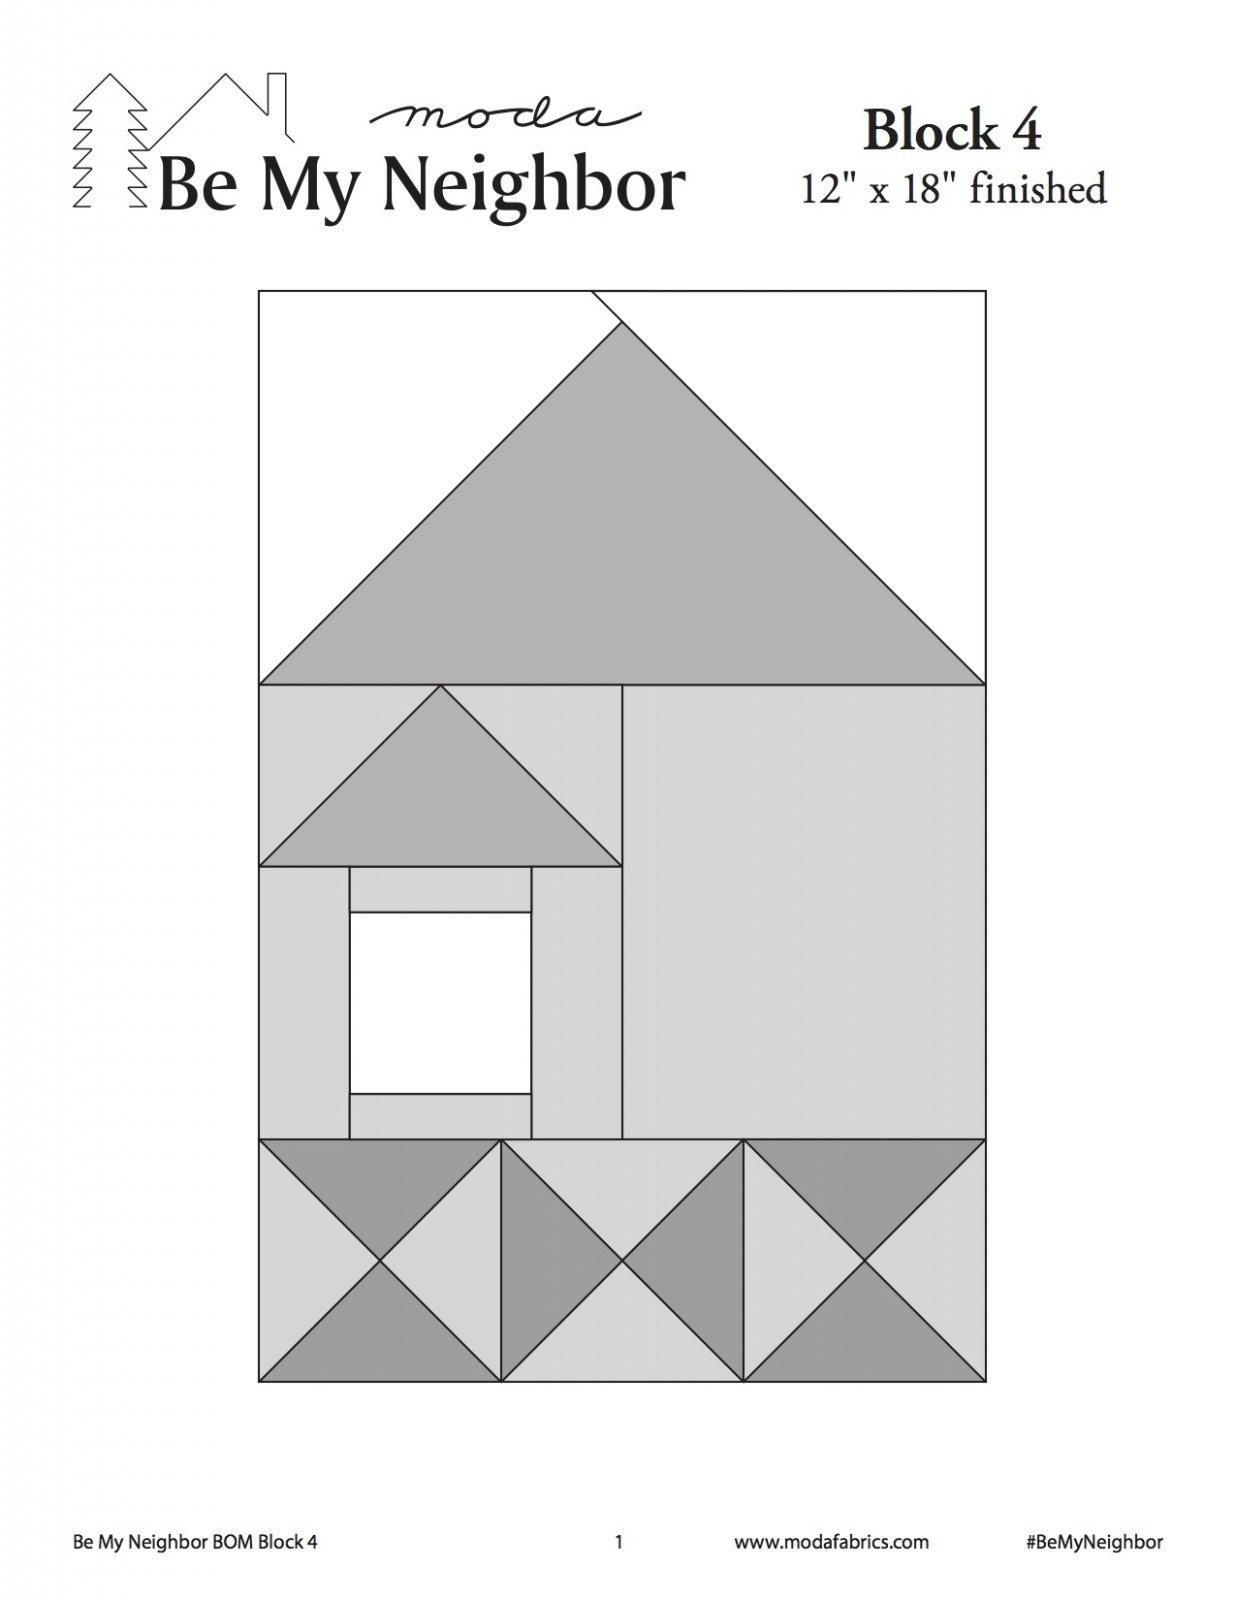 Be My Neighbor Quilt Along Block 4